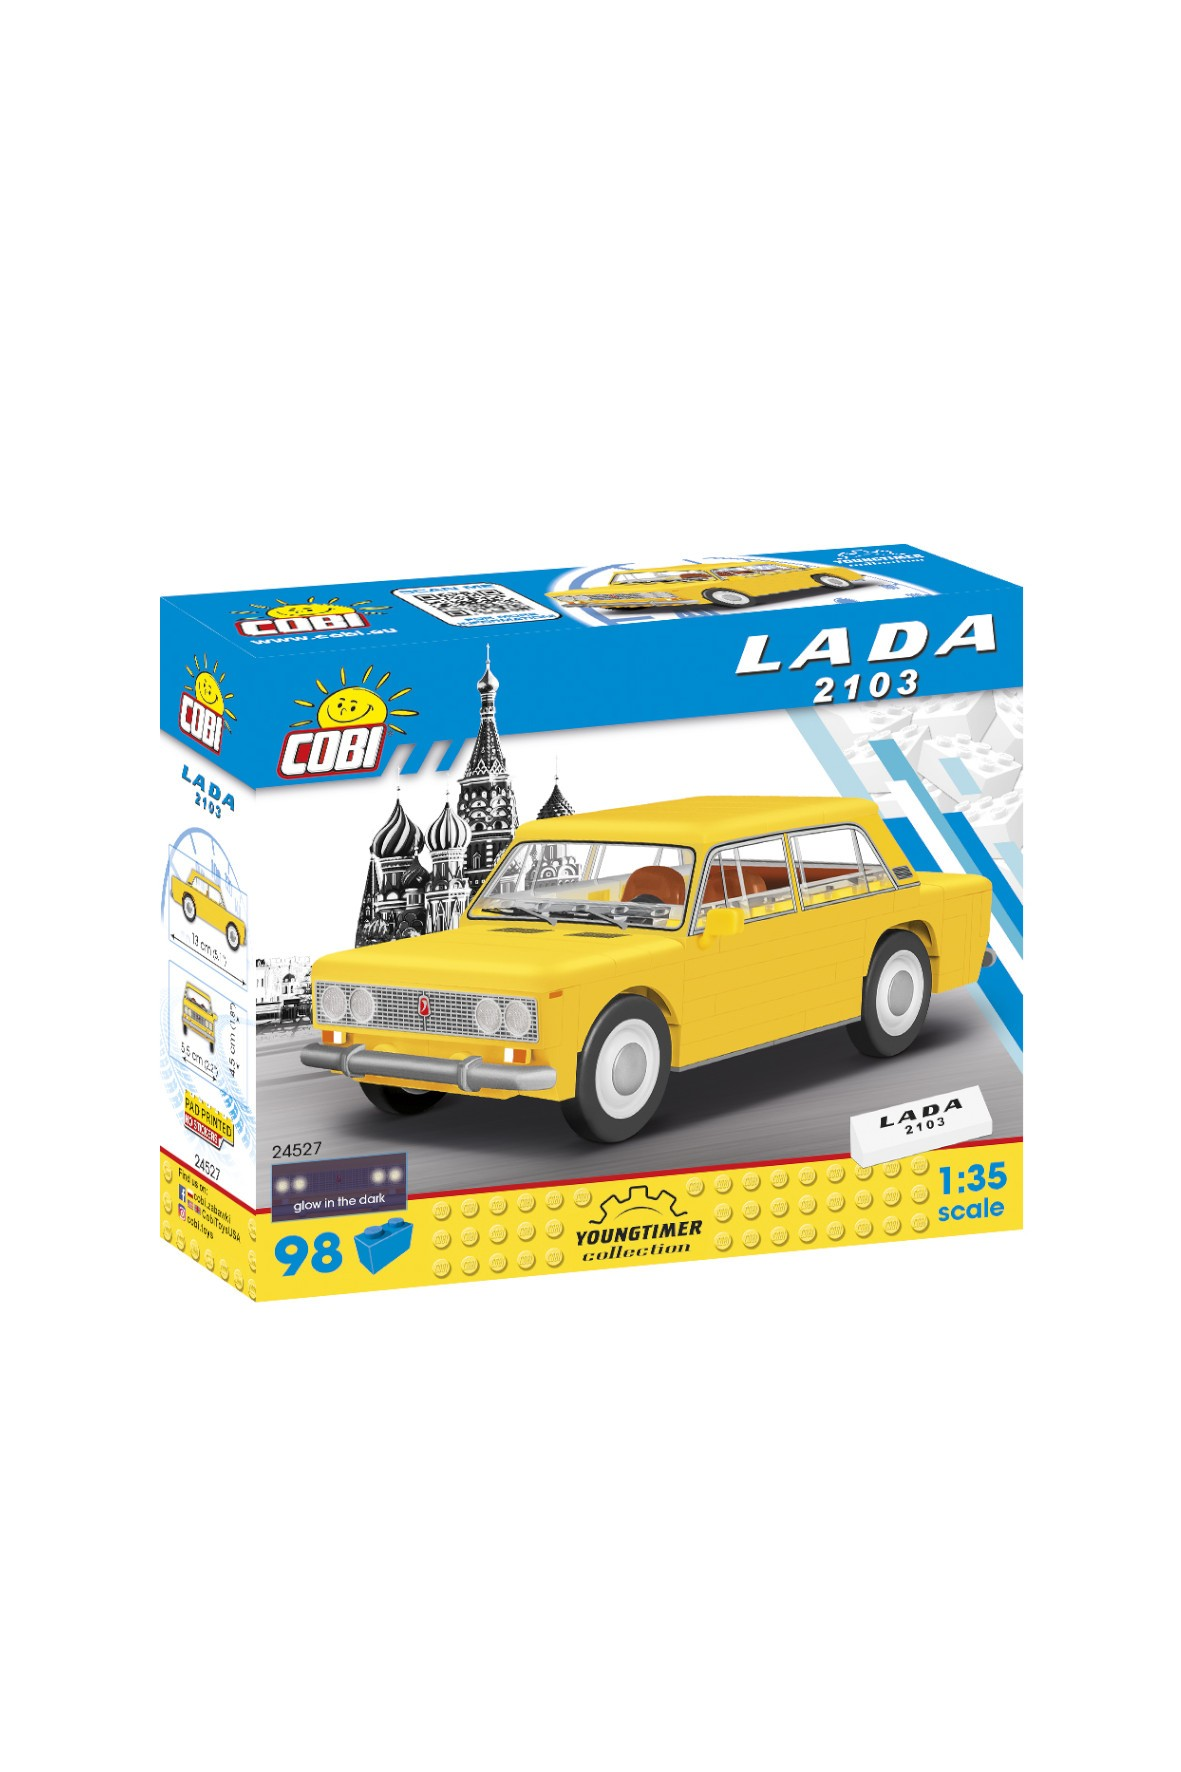 Klocki COBI 1972 Lada 2103 (Lada 1500) wiek 5+